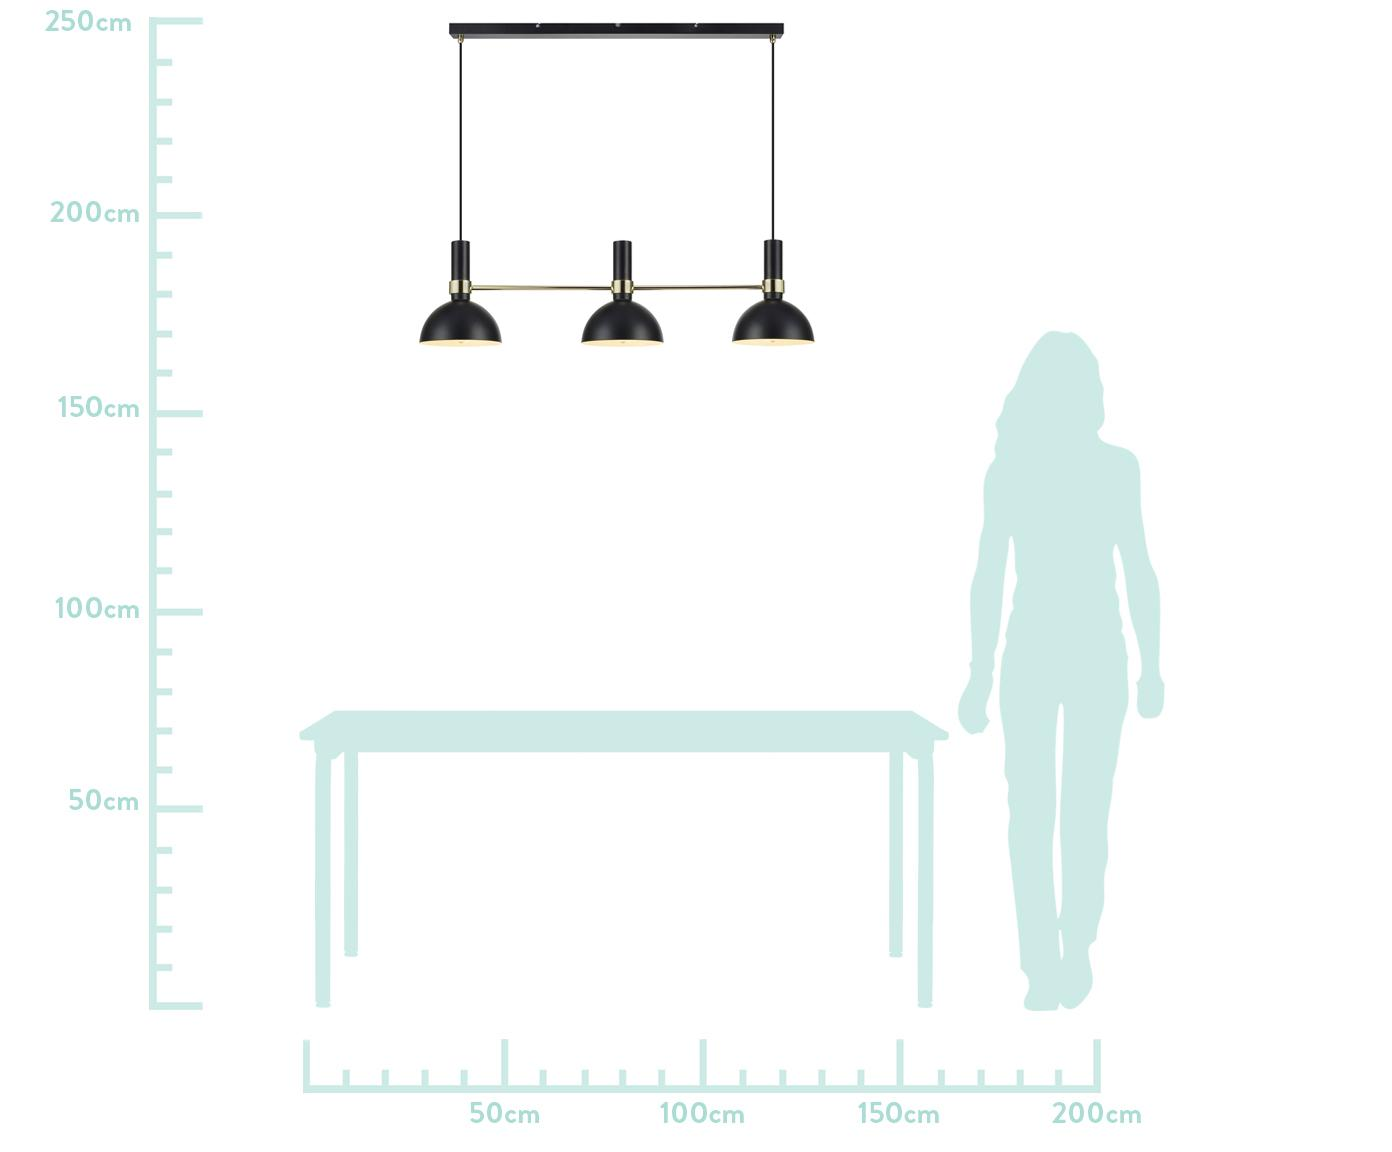 Große Design-Pendelleuchte Larry, Schwarz,Messing, 100 x 24 cm